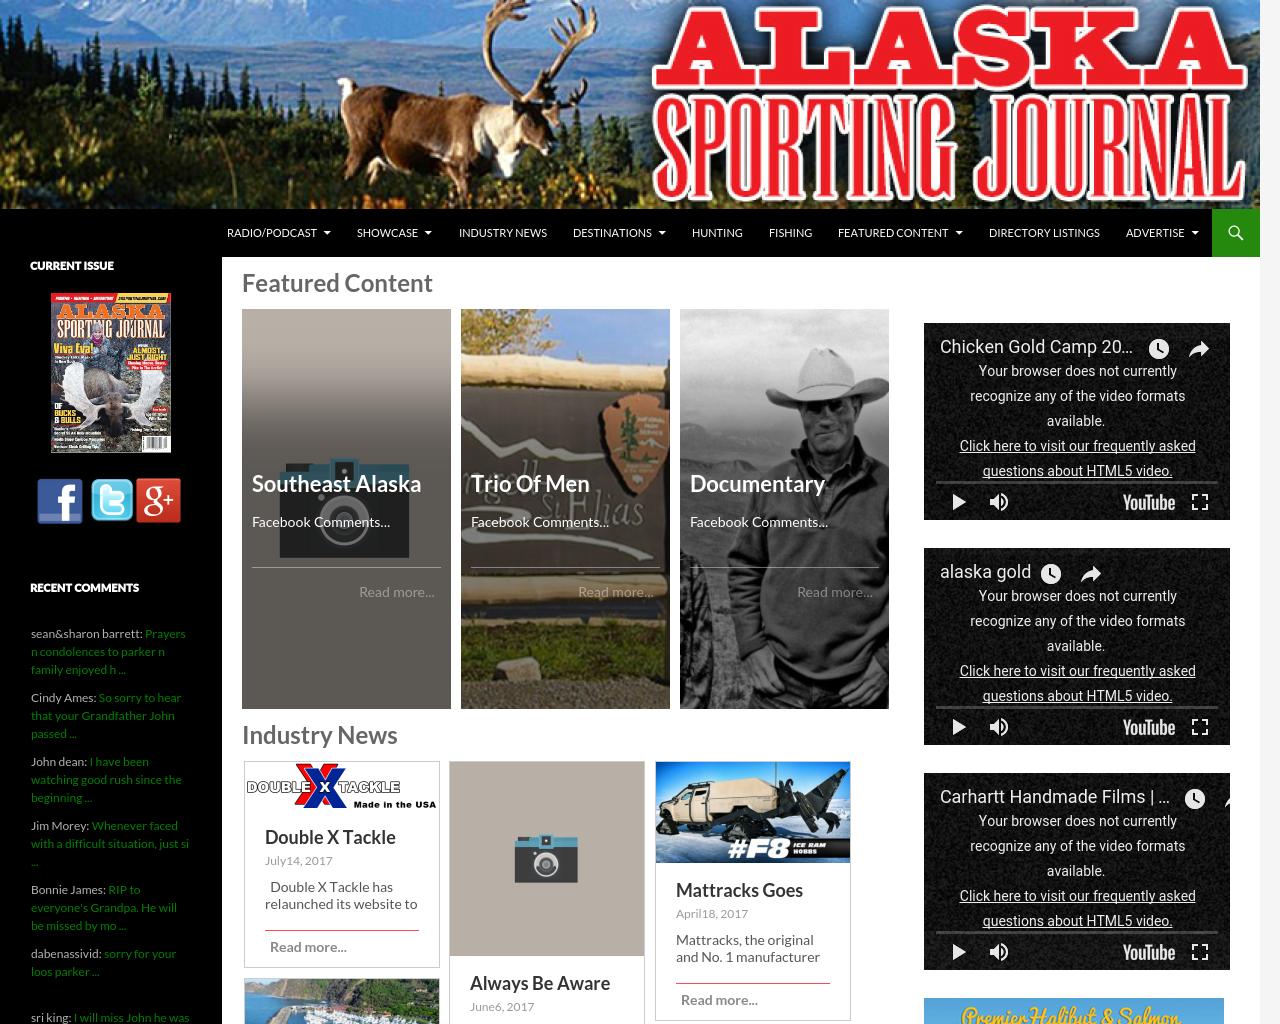 Alaska-Sporting-Journal-Advertising-Reviews-Pricing